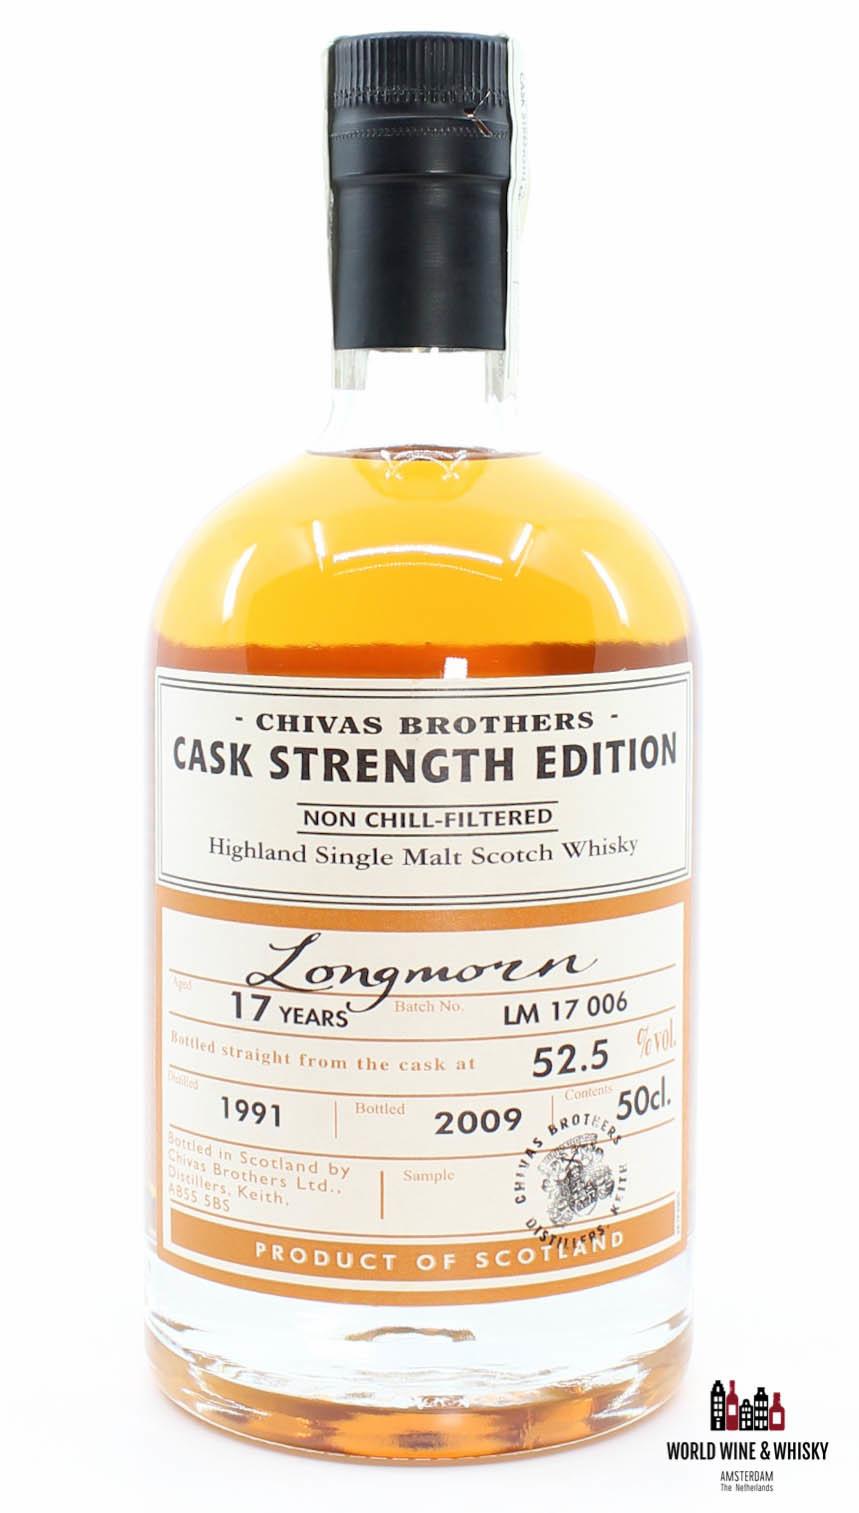 Longmorn Longmorn 17 Years Old 1991 2009 Batch LM 17 006 - Chivas Brothers - Cask Strength Edition 52.5%